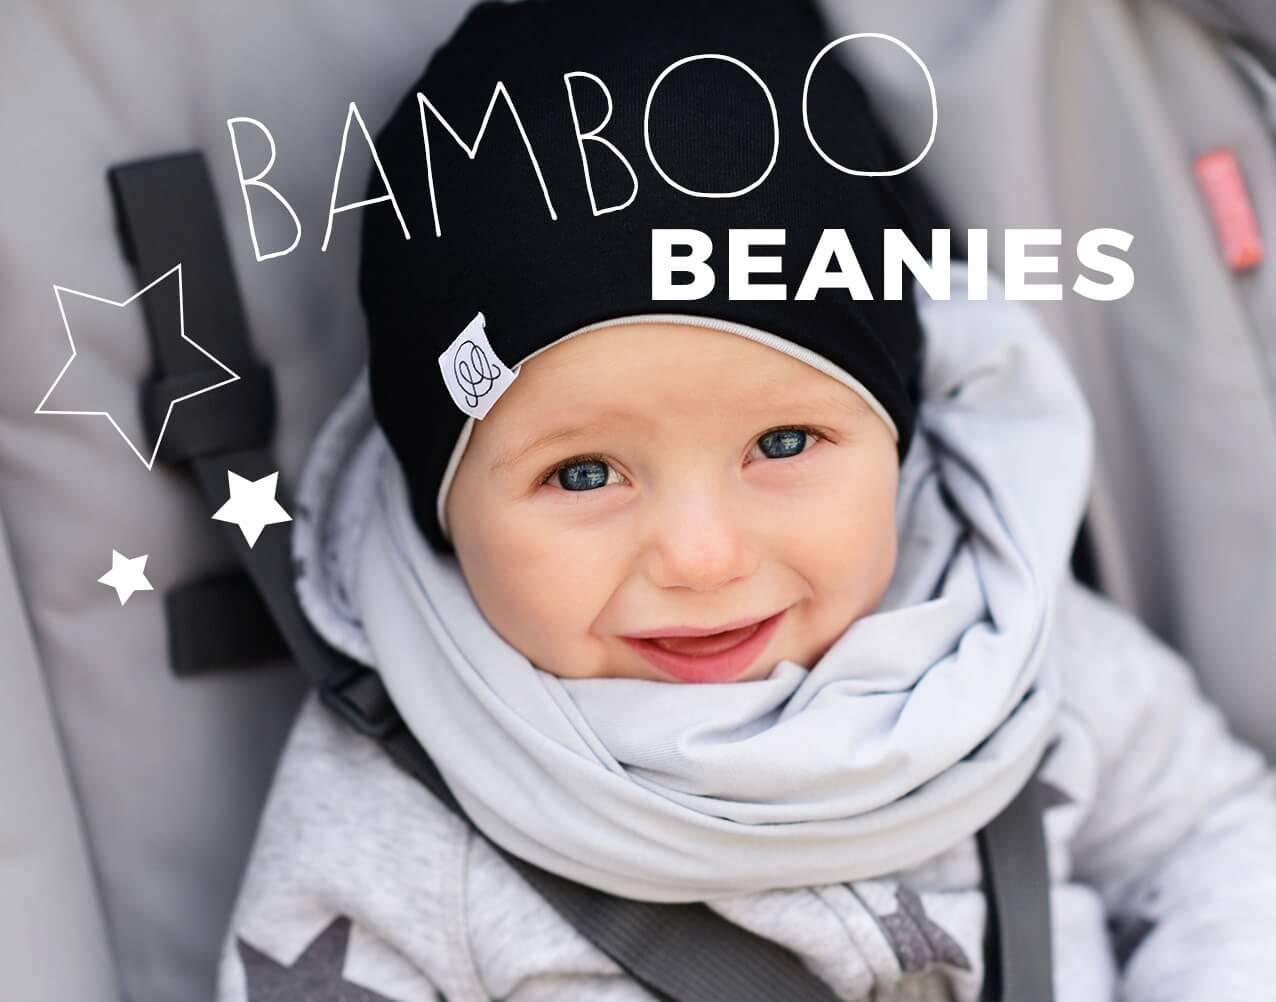 Bamboo beanies